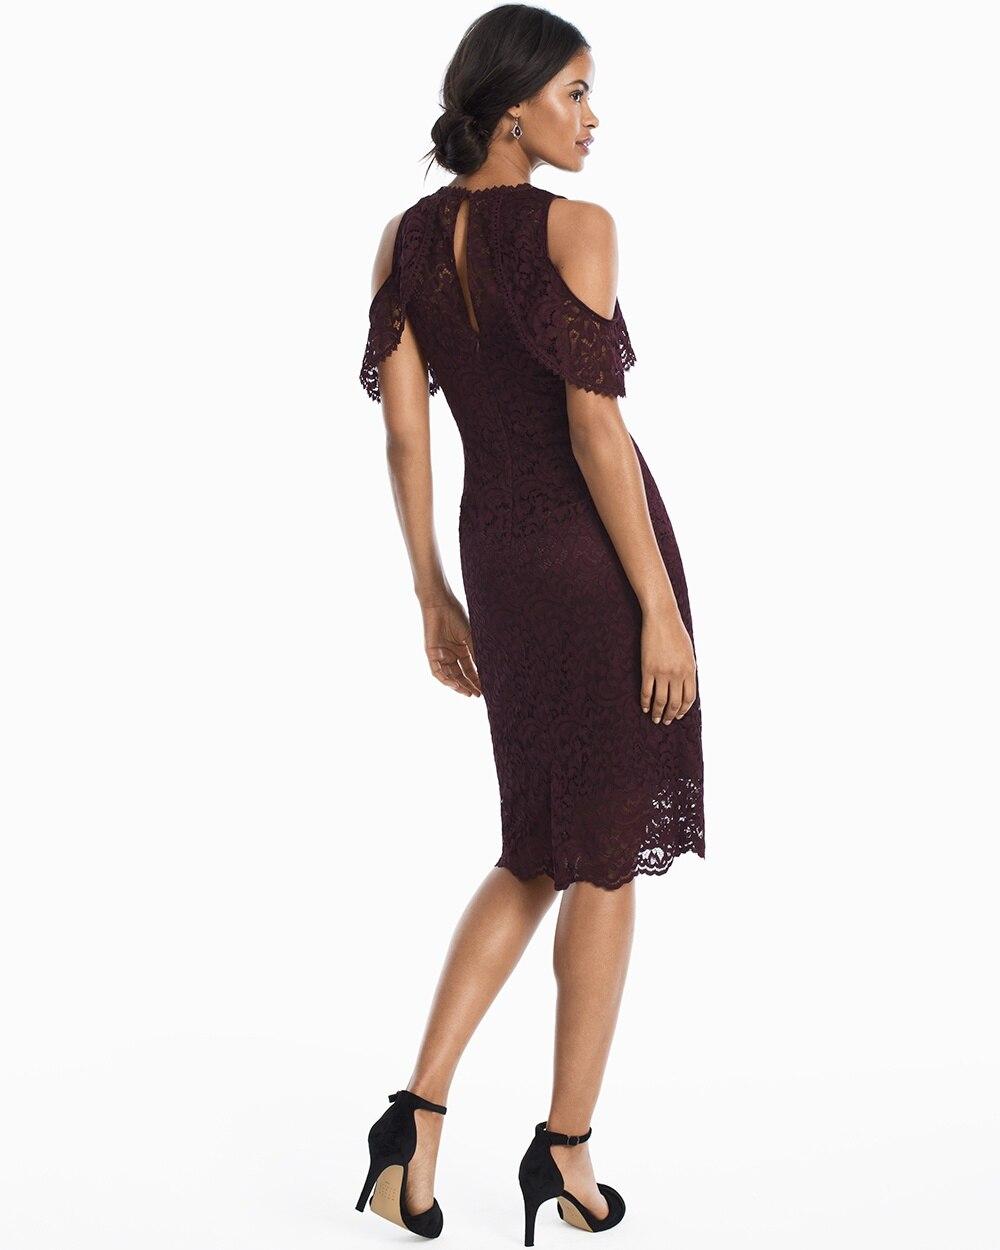 e81fffed61fa Return to thumbnail image selection Cold-Shoulder Lace Sheath Dress